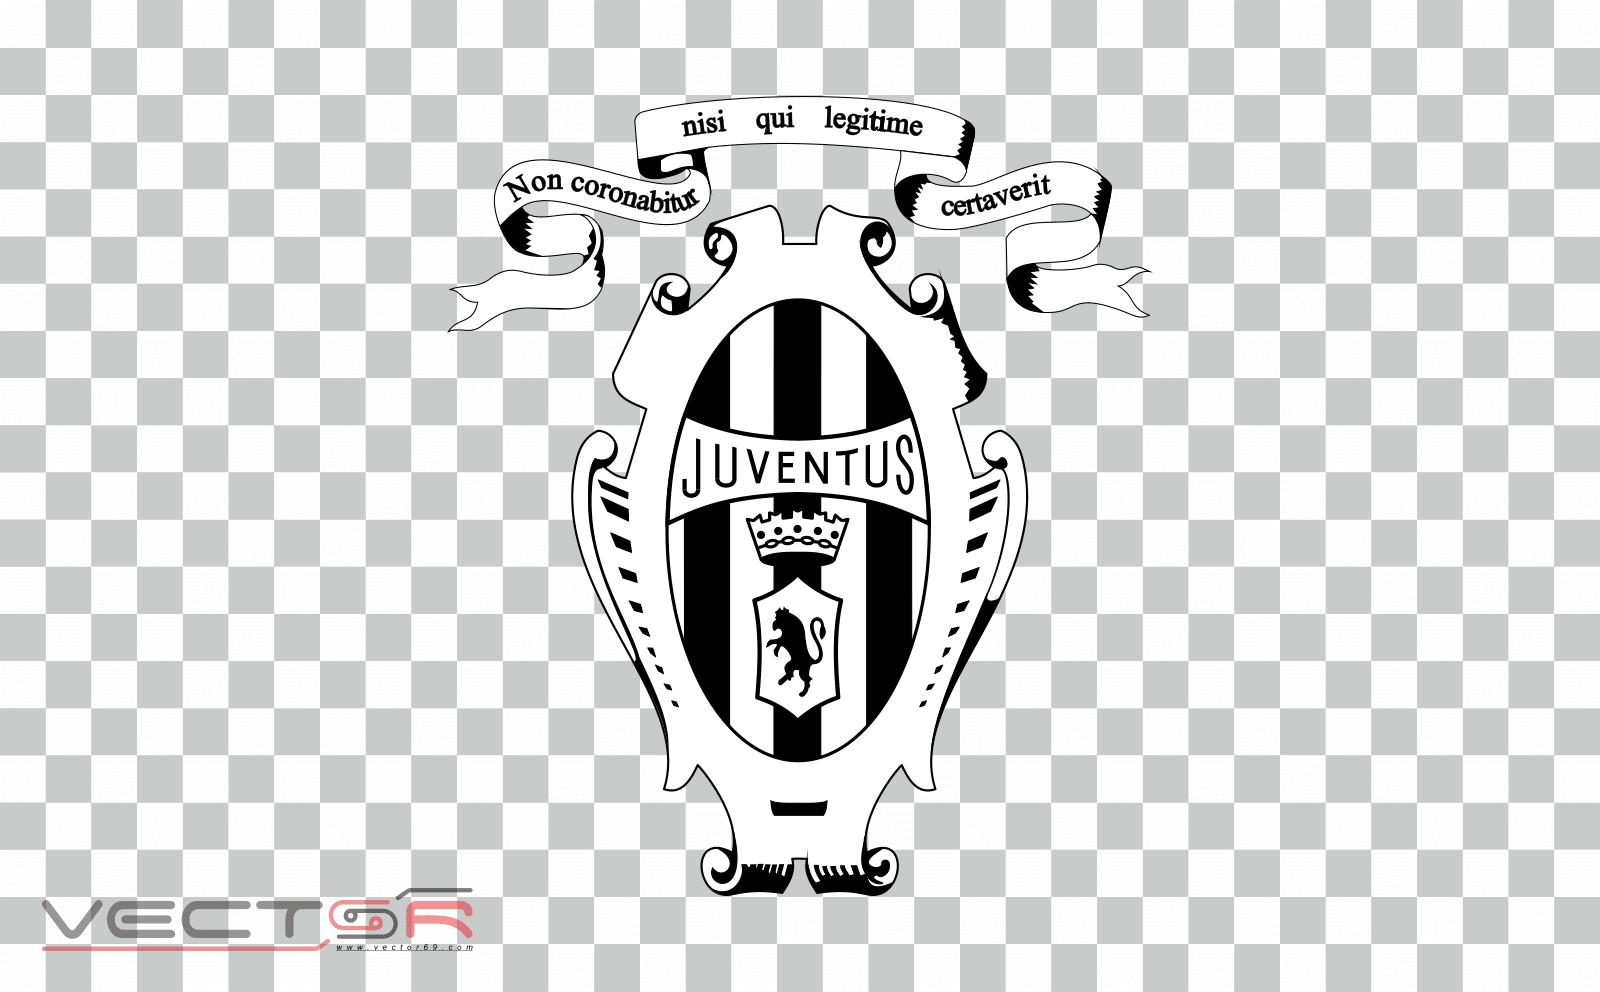 Stemma della Juventus (1905) Logo - Download .PNG (Portable Network Graphics) Transparent Images